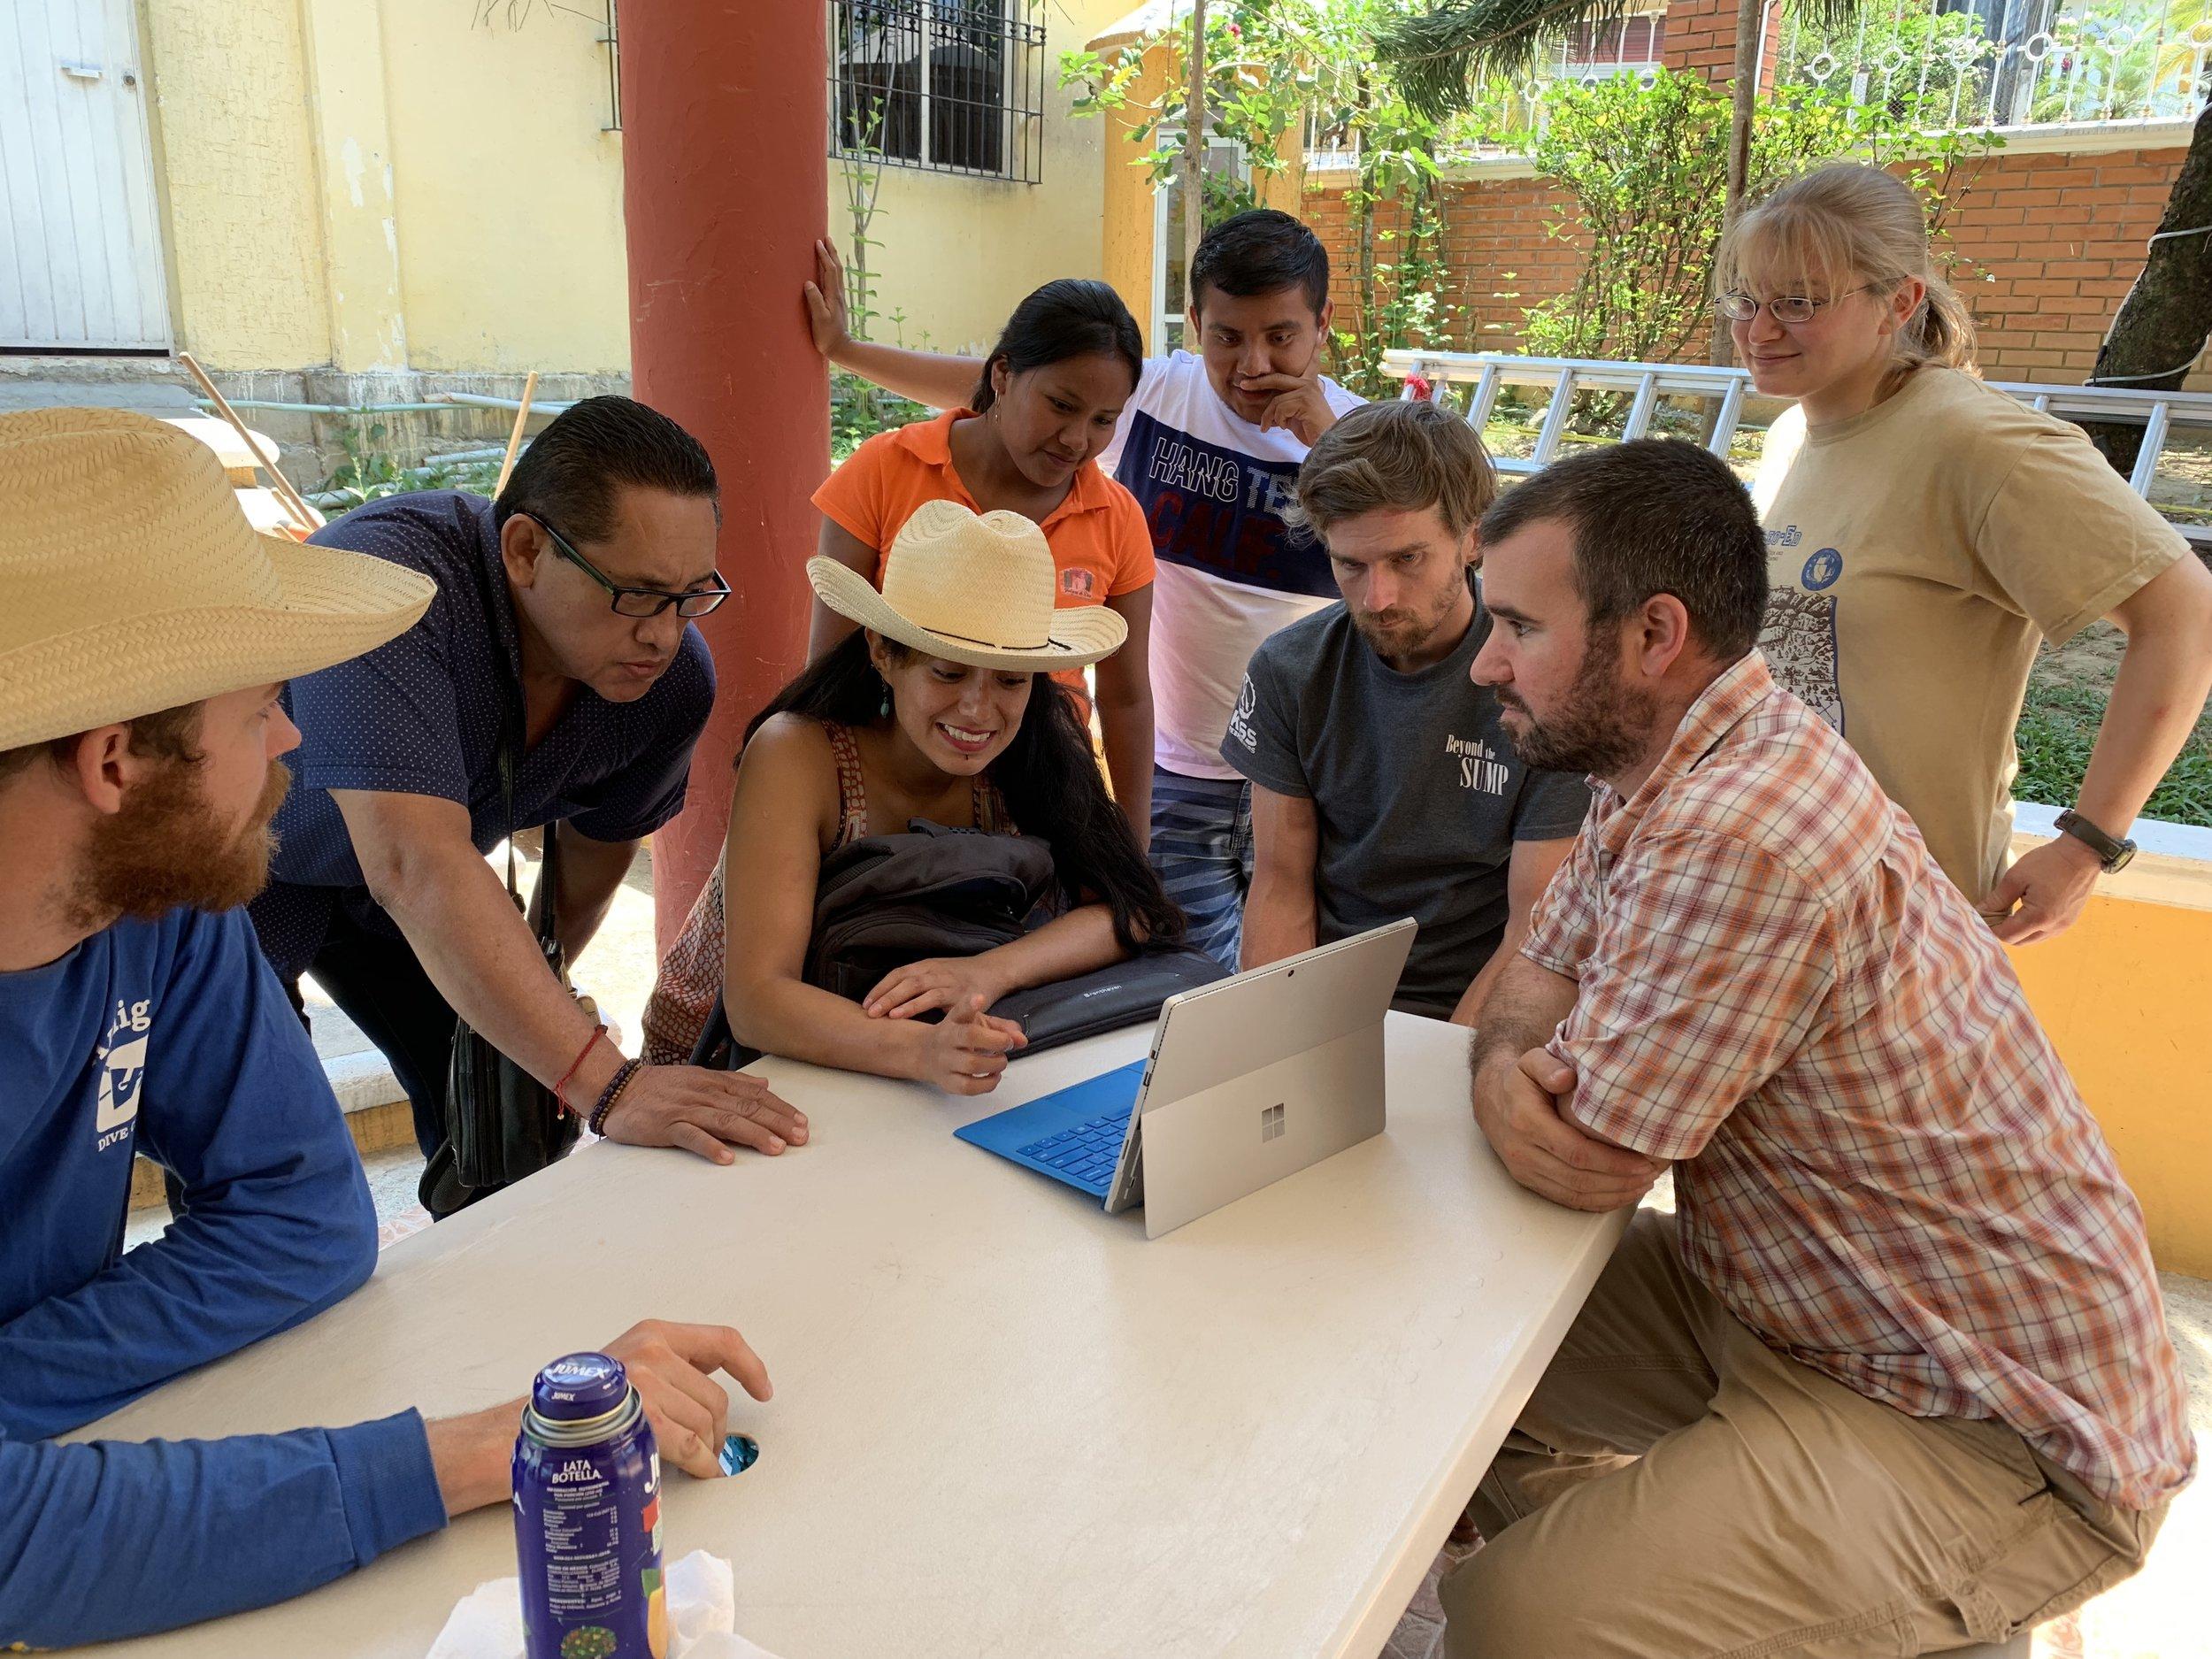 The team presenting photos and videos to officials of San Felipe Jalapa de Díaz. Photo by Teddy Garlock.